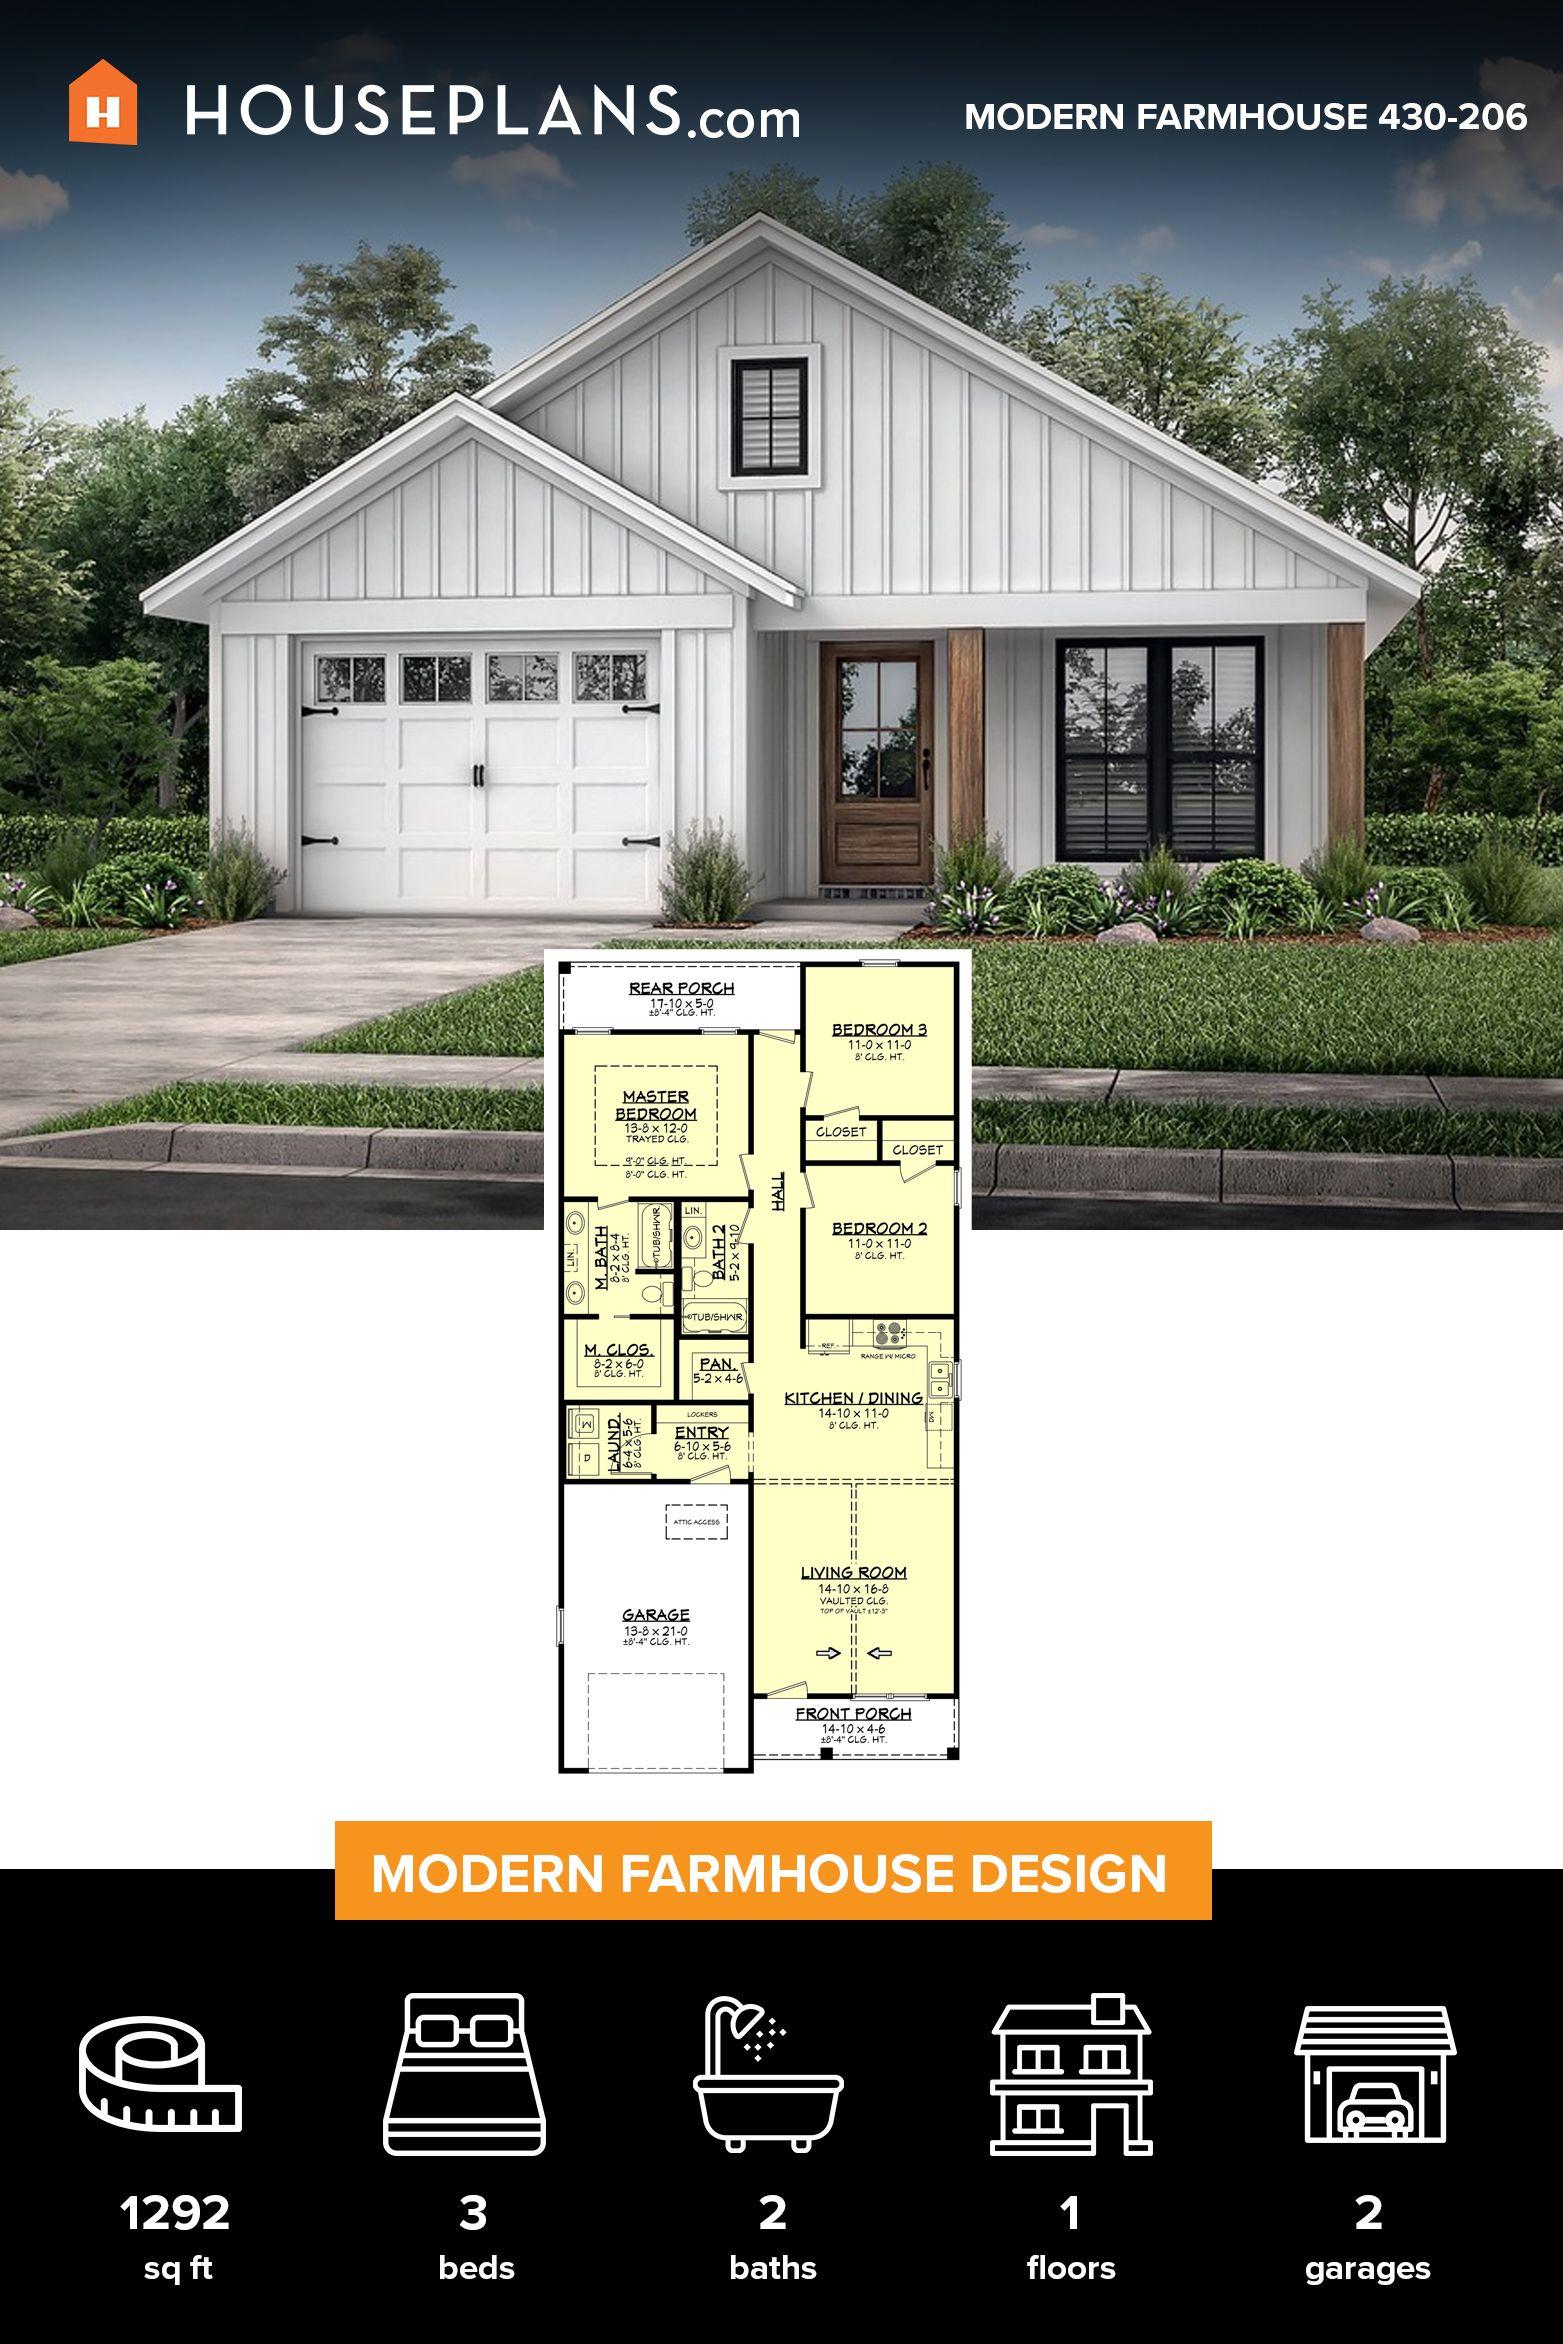 Farmhouse Style House Plan 3 Beds 2 Baths 1292 Sq Ft Plan 430 206 Small Farmhouse Plans Affordable House Plans Narrow House Plans